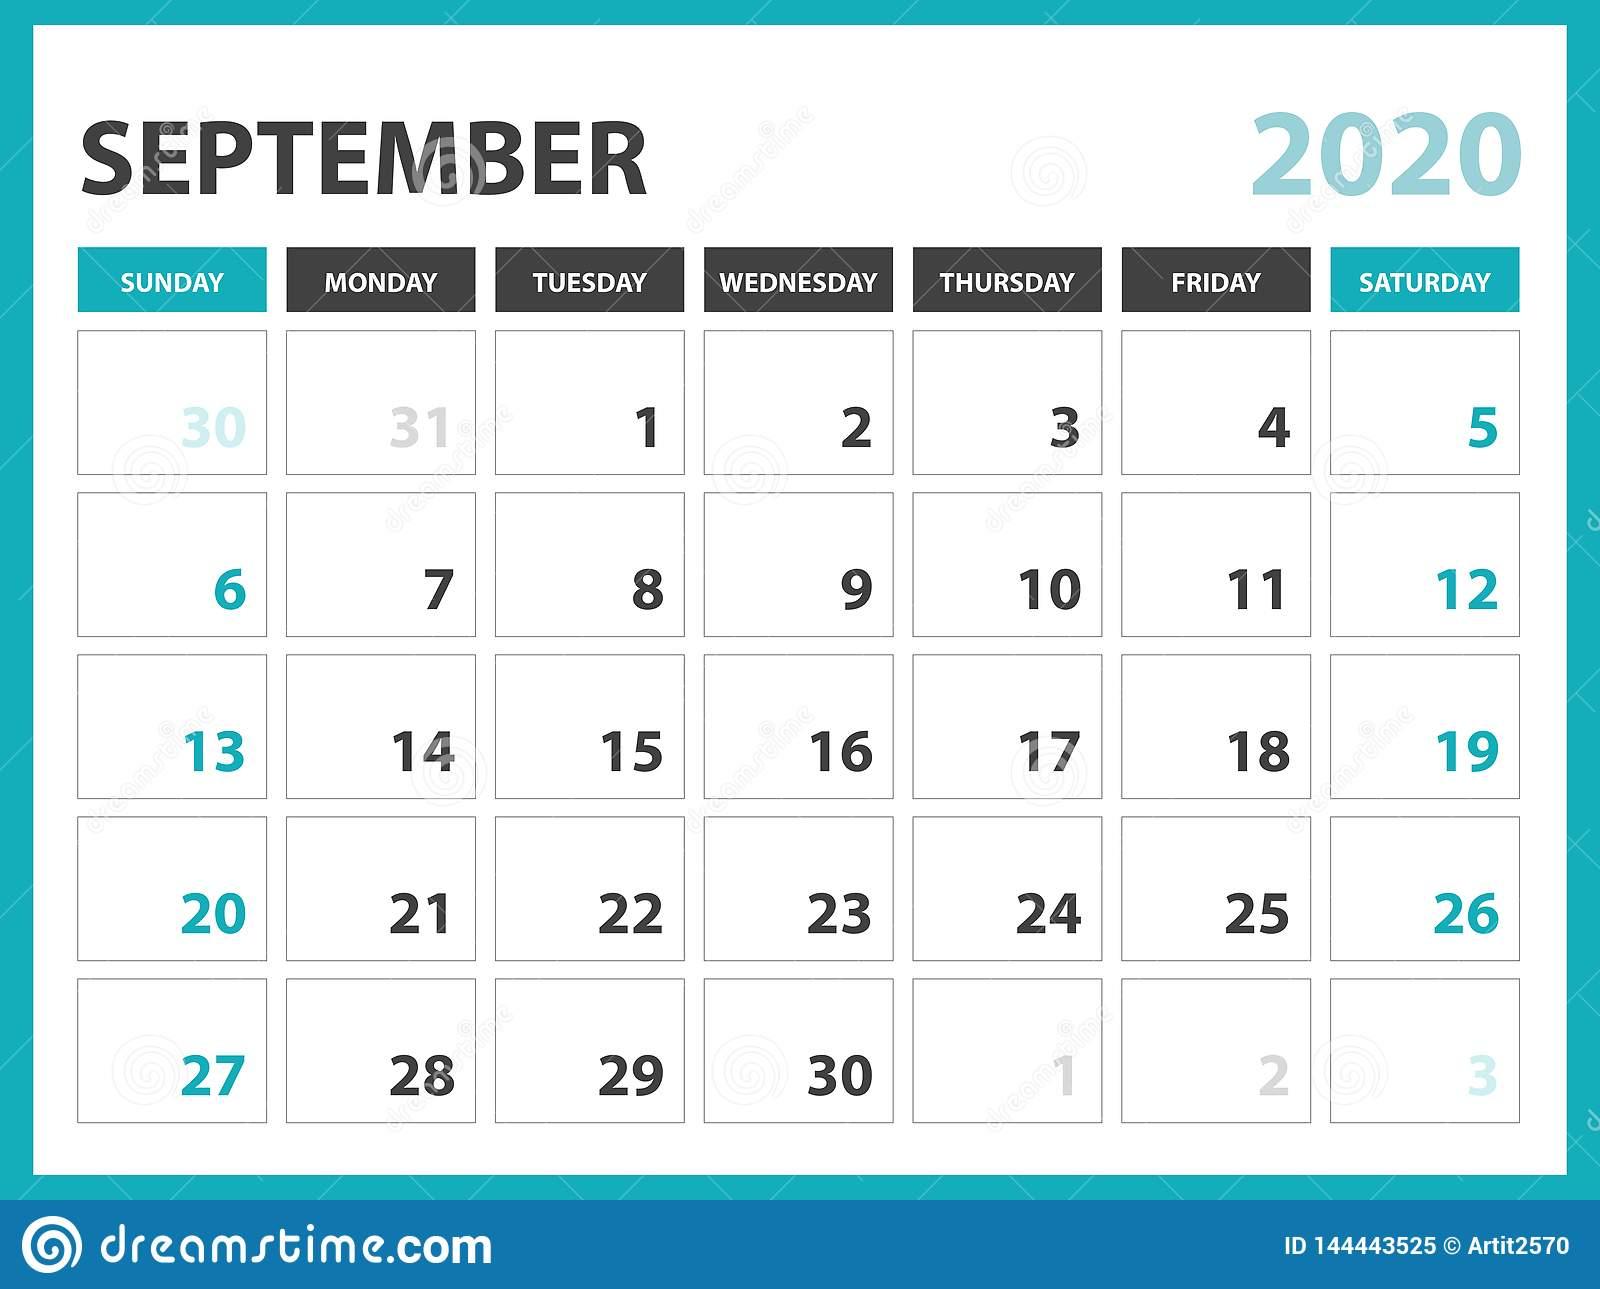 Desk Calendar Layout Size 8 X 6 Inch, September 2020 Calendar with regard to 10 X 8 Planner Template